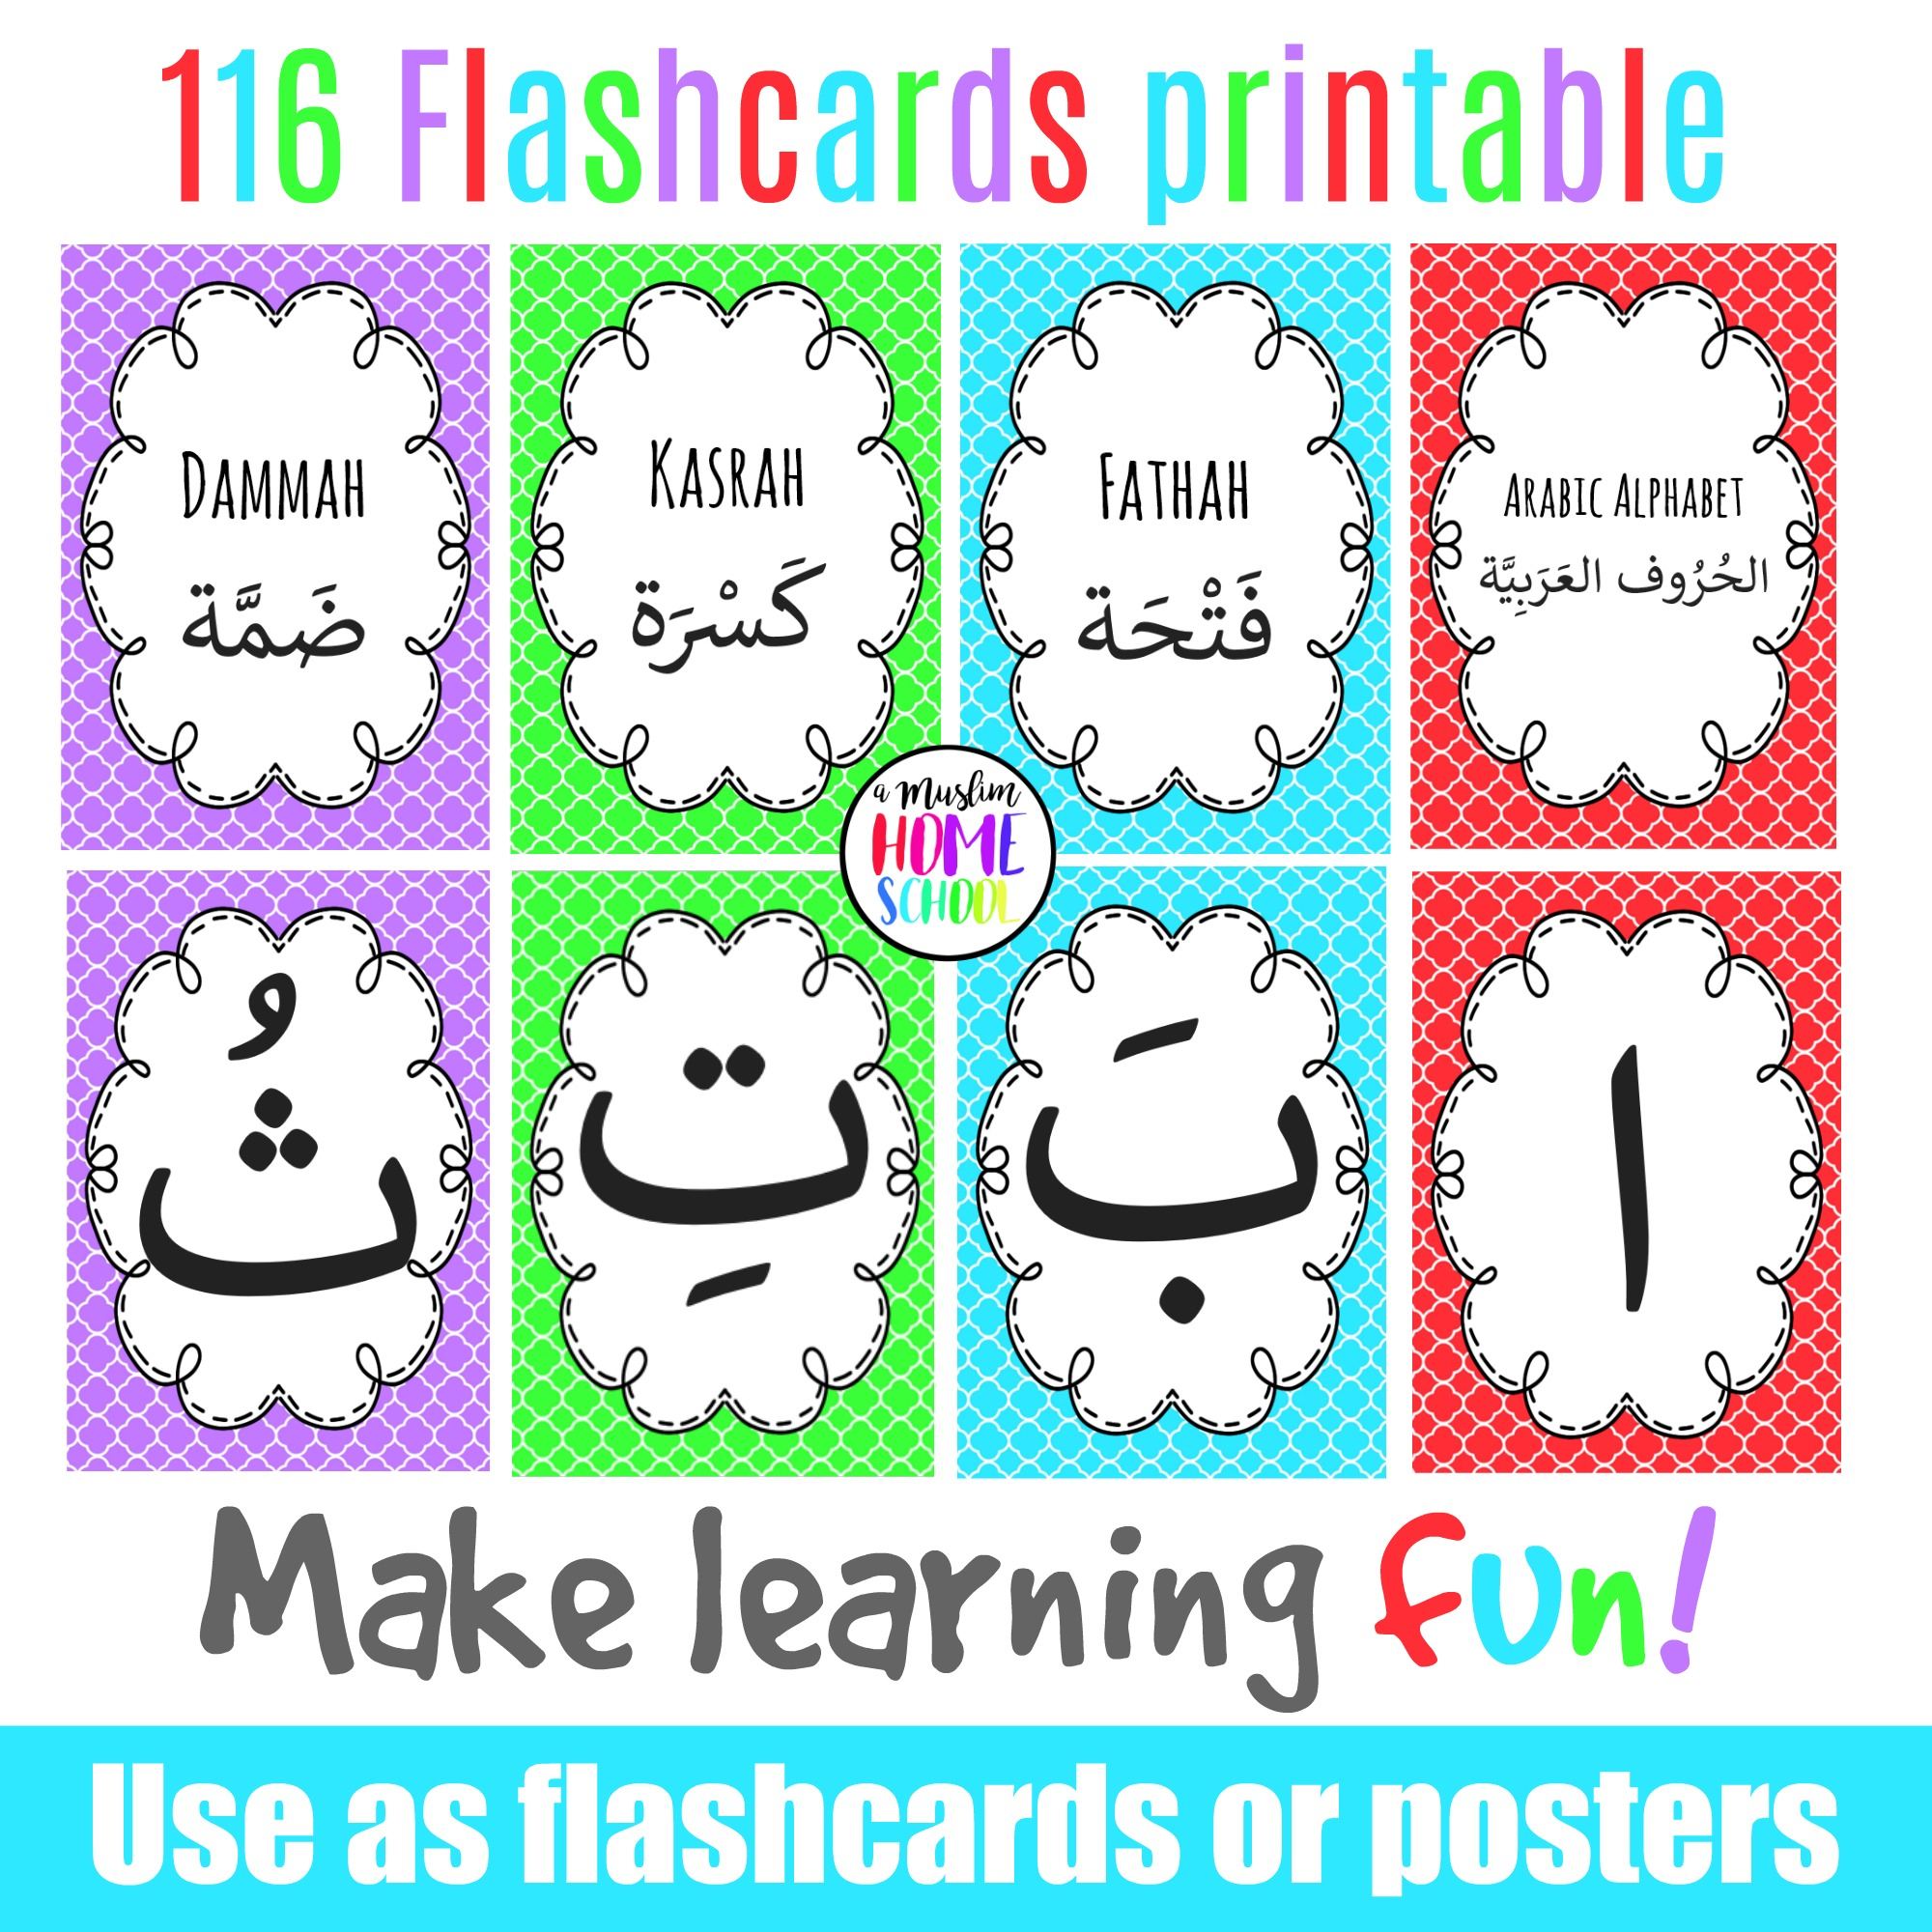 Arabic Alphabet Poster Flashcards with regard to Arabic Alphabet Poster Printable